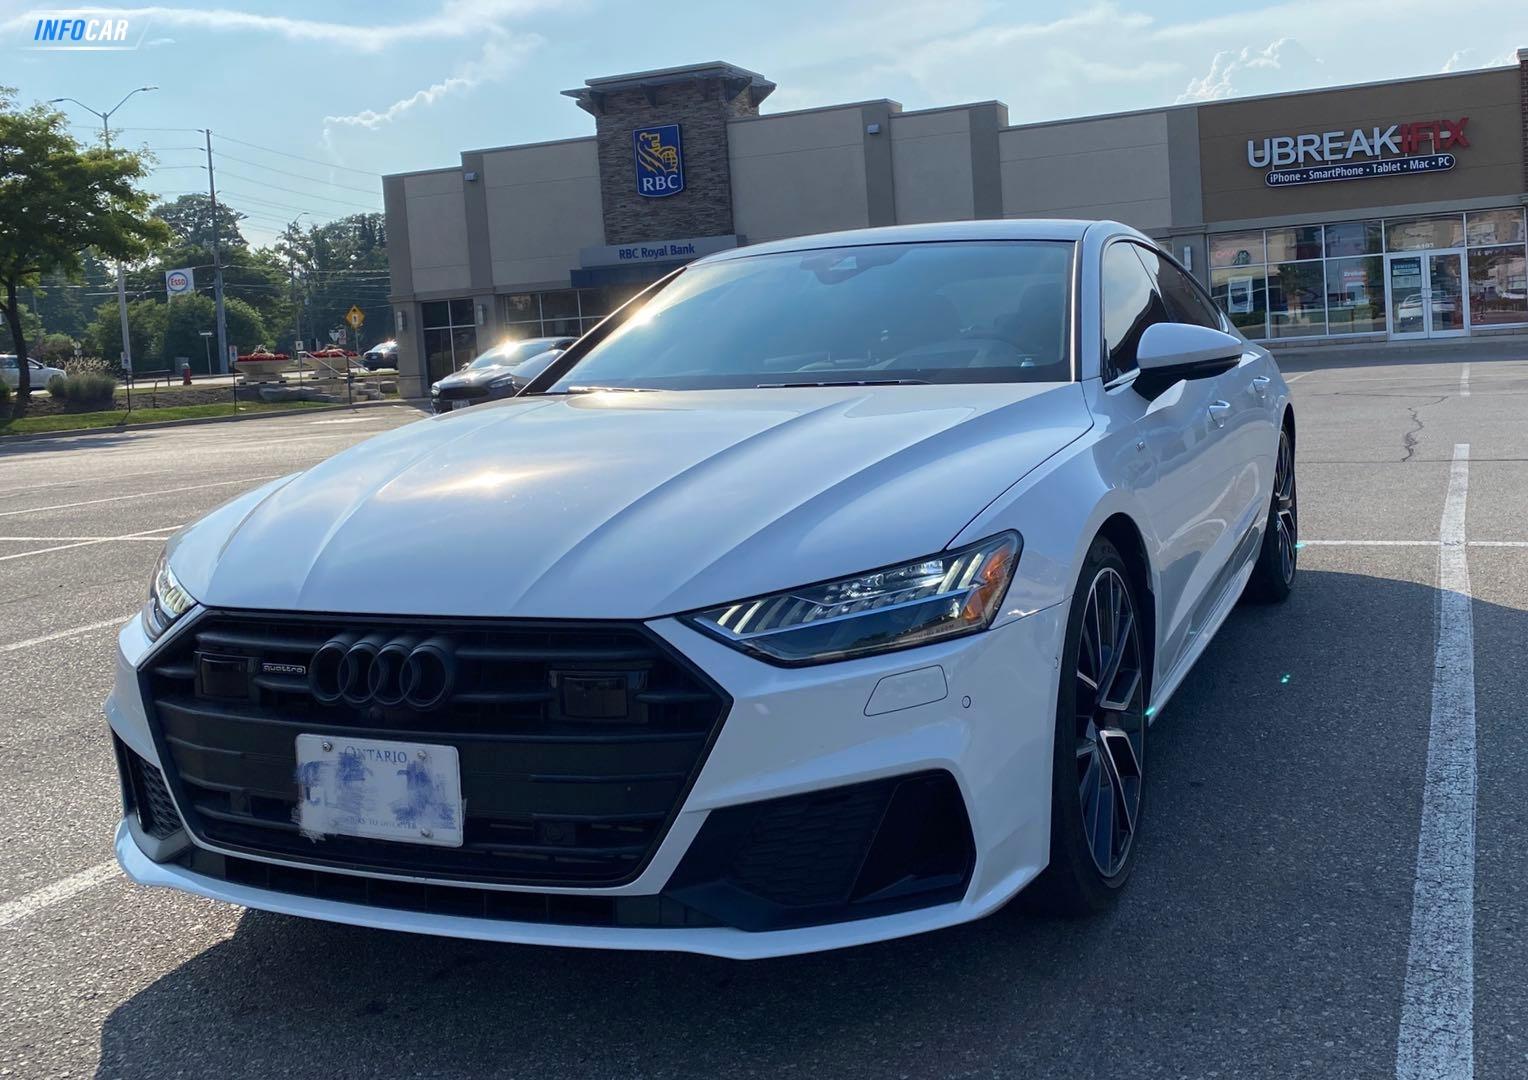 2019 Audi A7 Technik - INFOCAR - Toronto's Most Comprehensive New and Used Auto Trading Platform